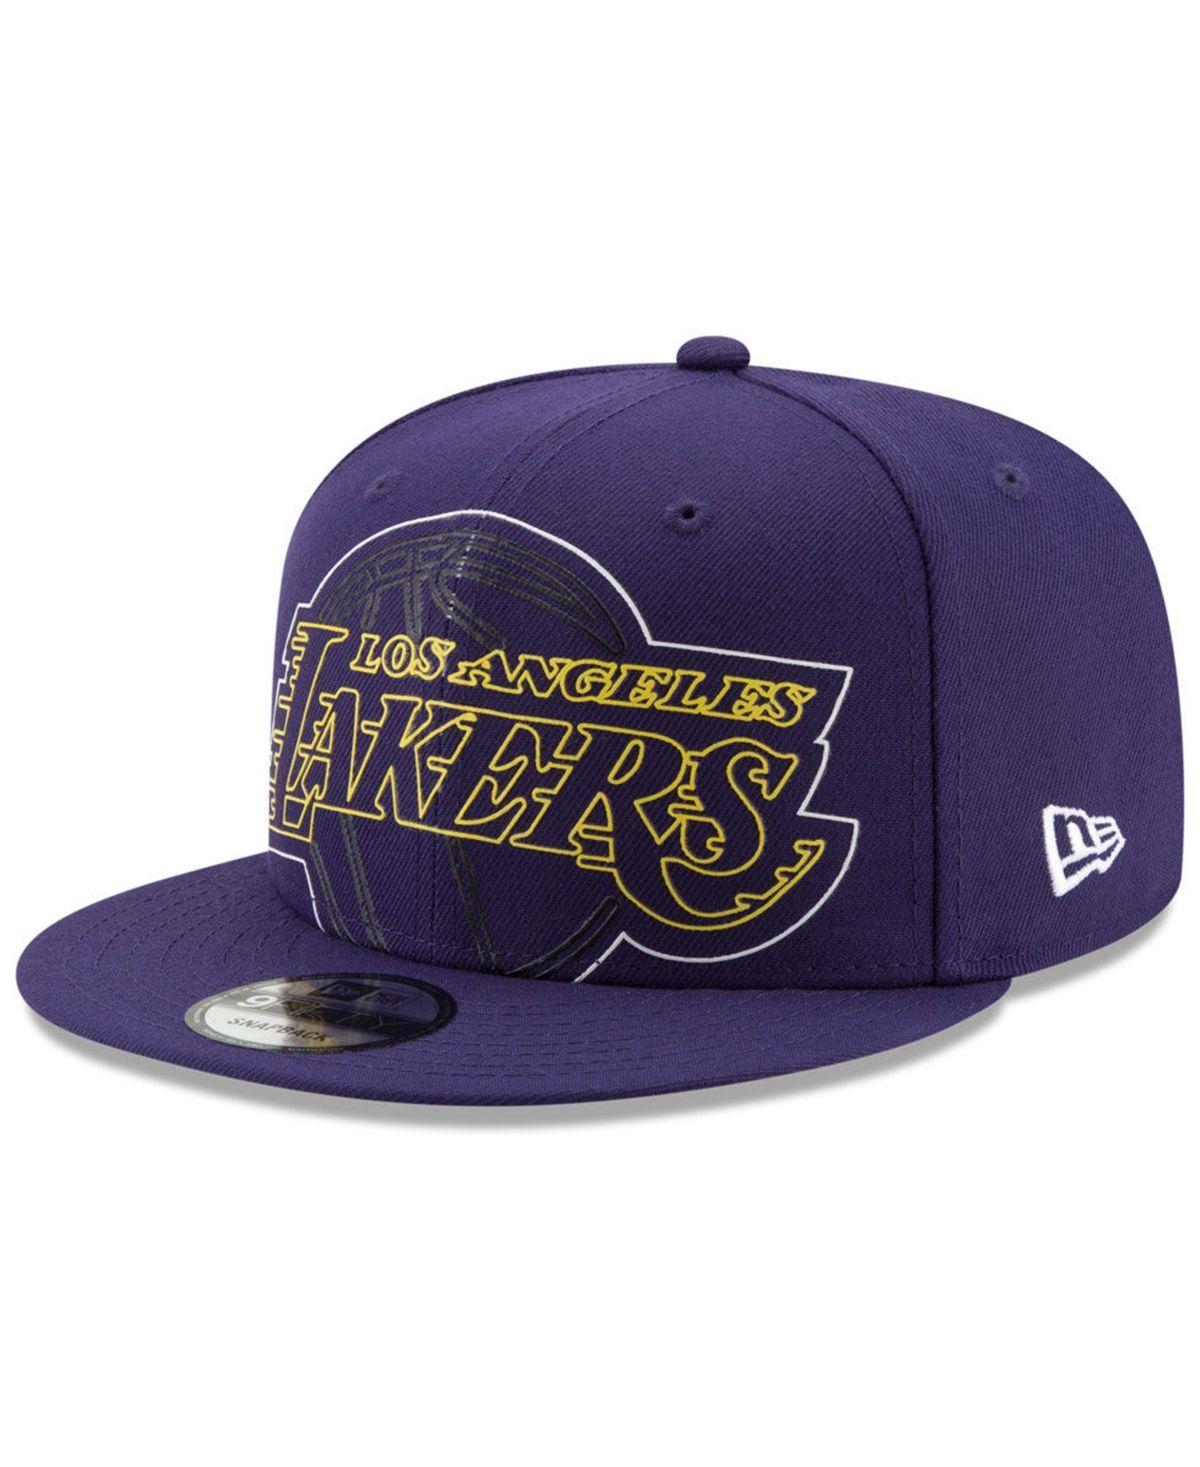 New Era Los Angeles Lakers Light It Up 9fifty Snapback Cap Purple New Era Los Angeles Lakers Snapback Cap